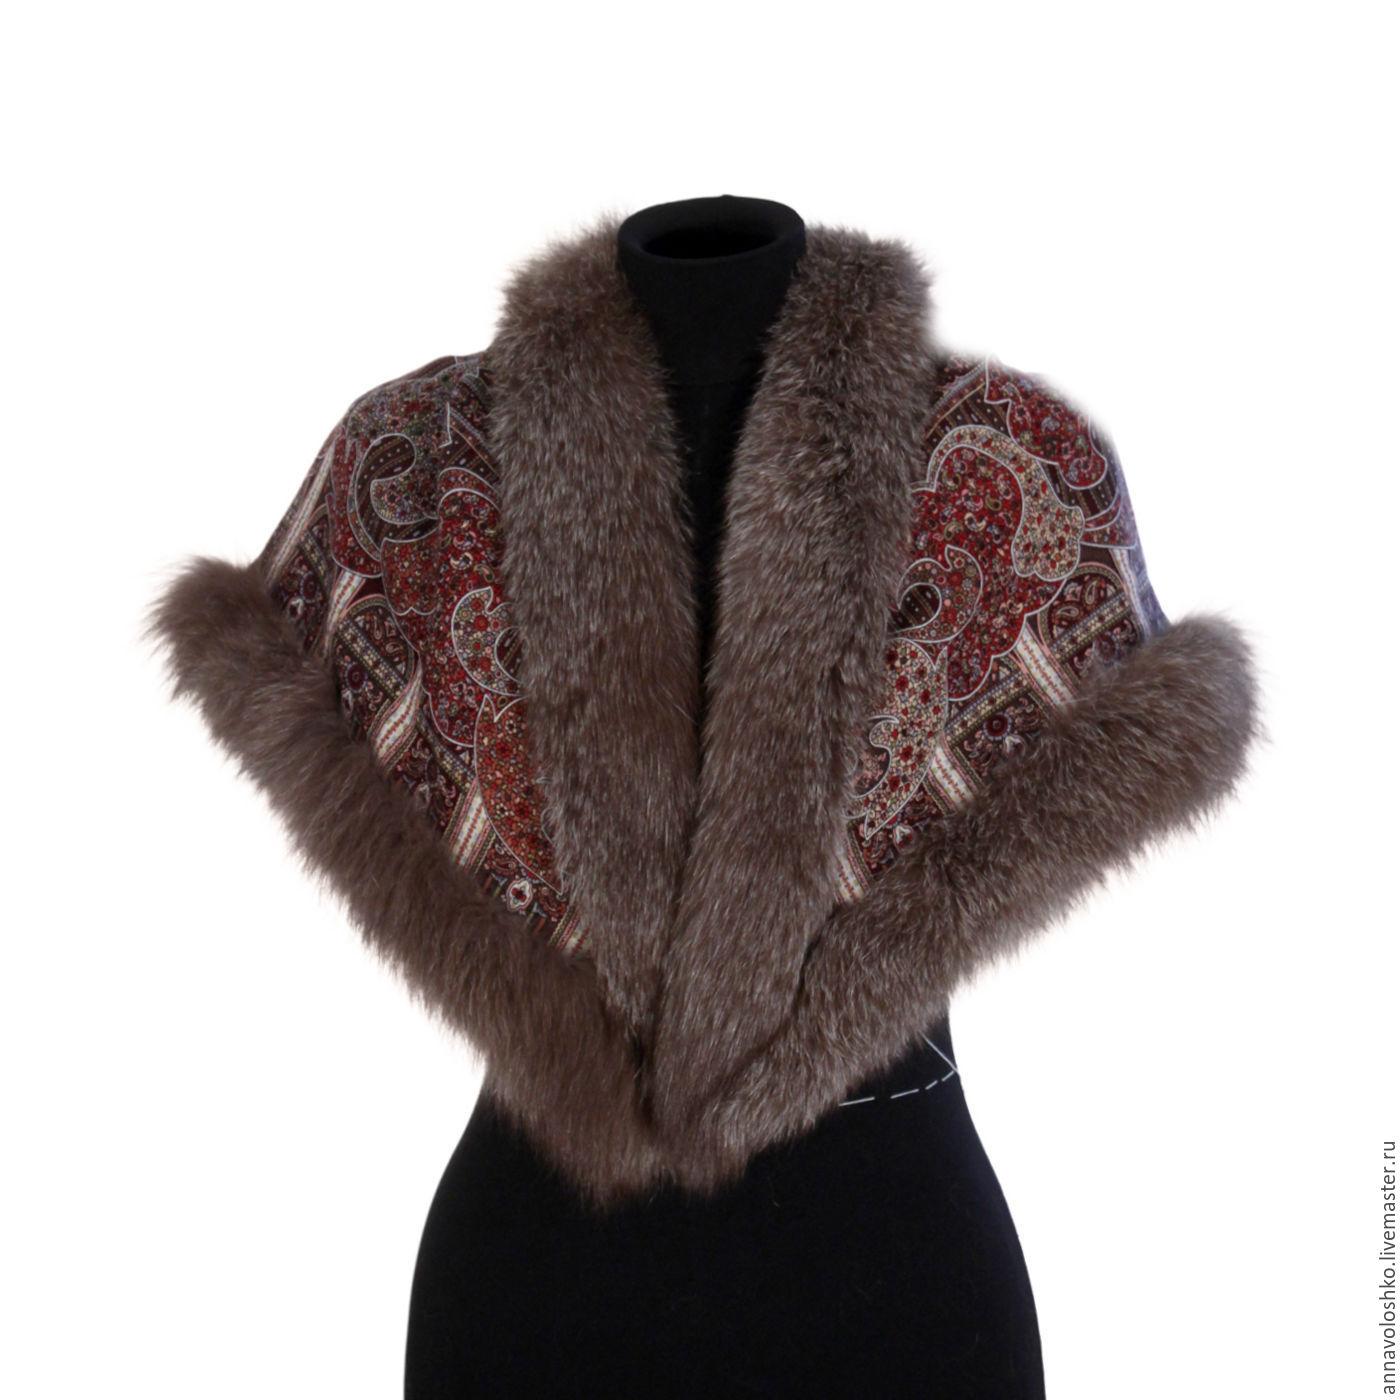 Pavlovo shawls with fur trimming.